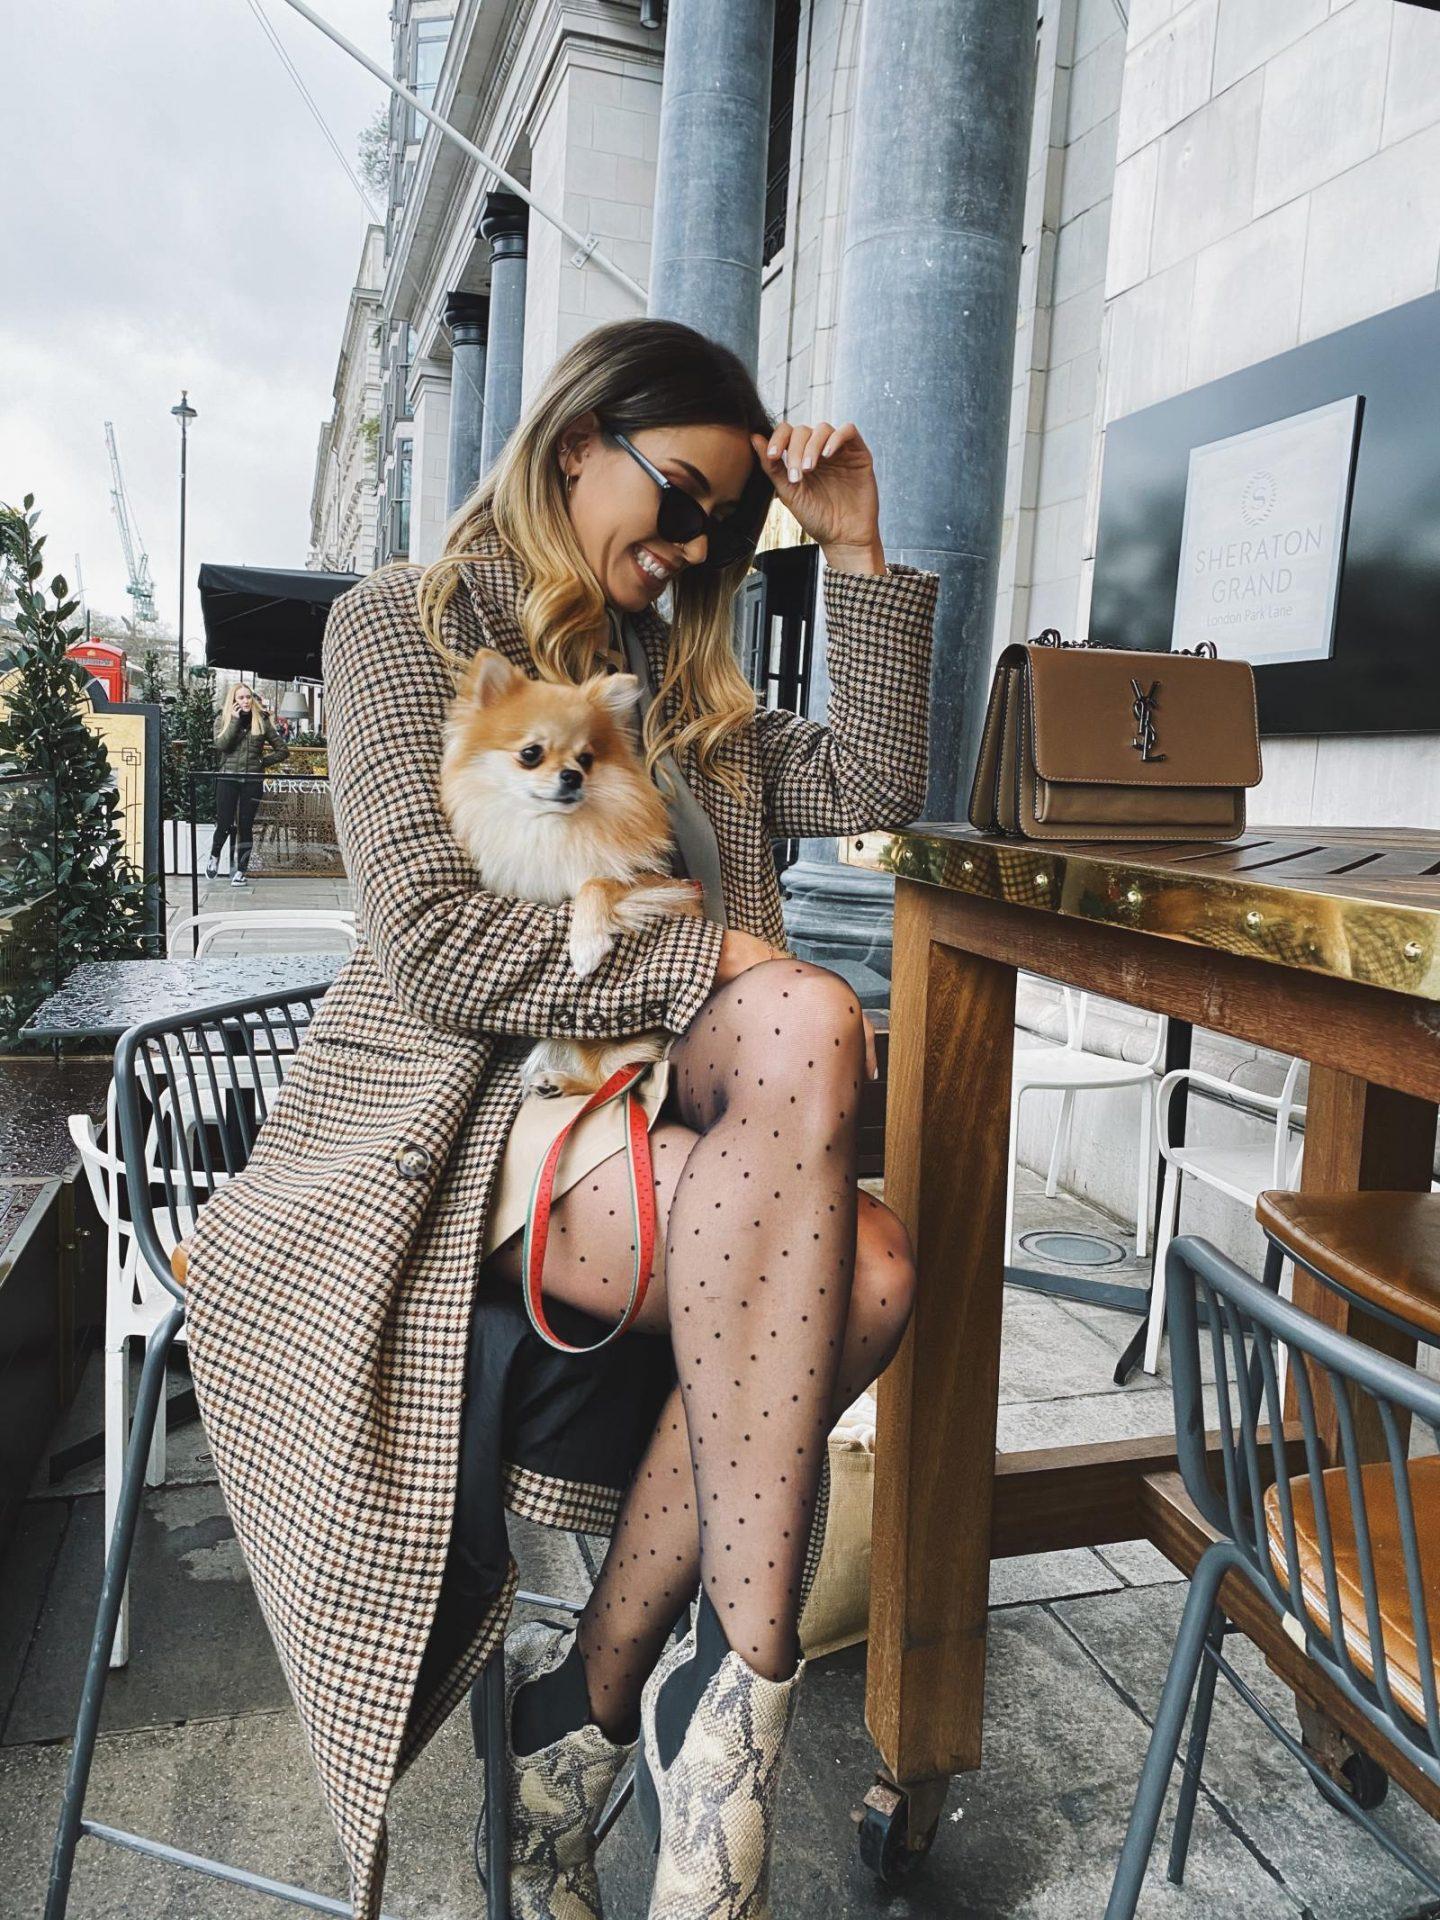 Dog friendly Smith & Whistle London